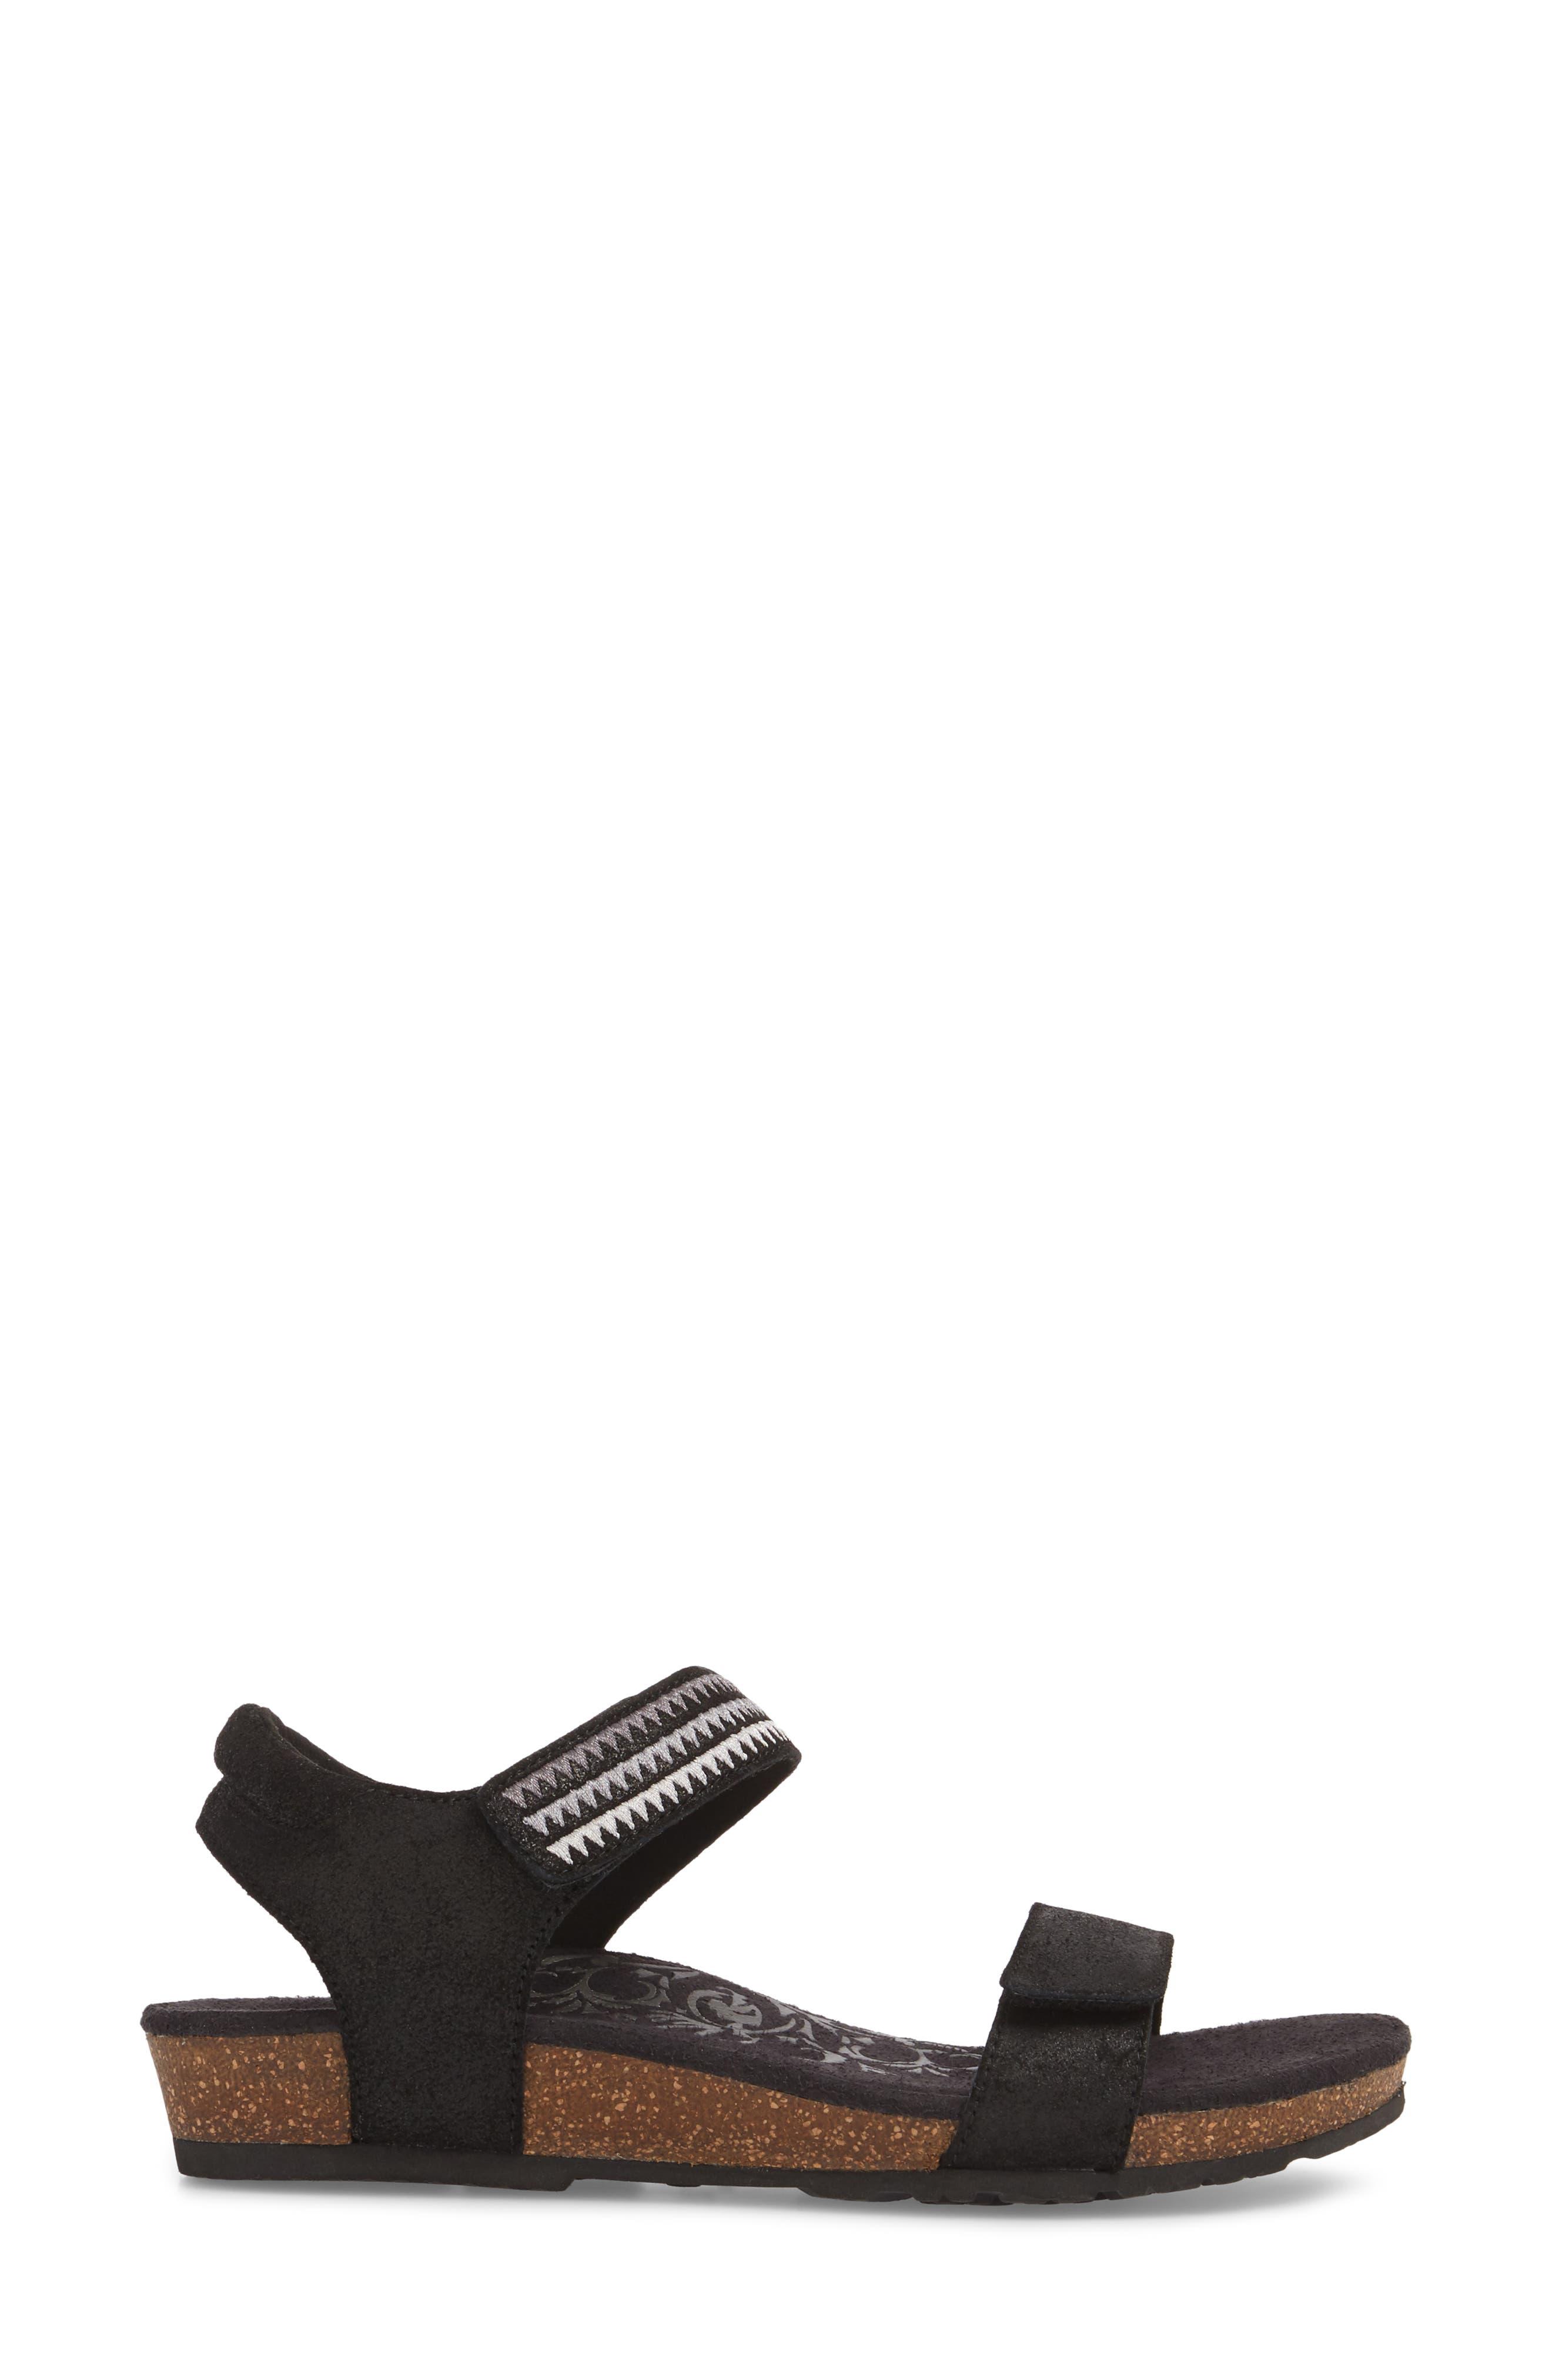 Capri Wedge Sandal,                             Alternate thumbnail 3, color,                             001